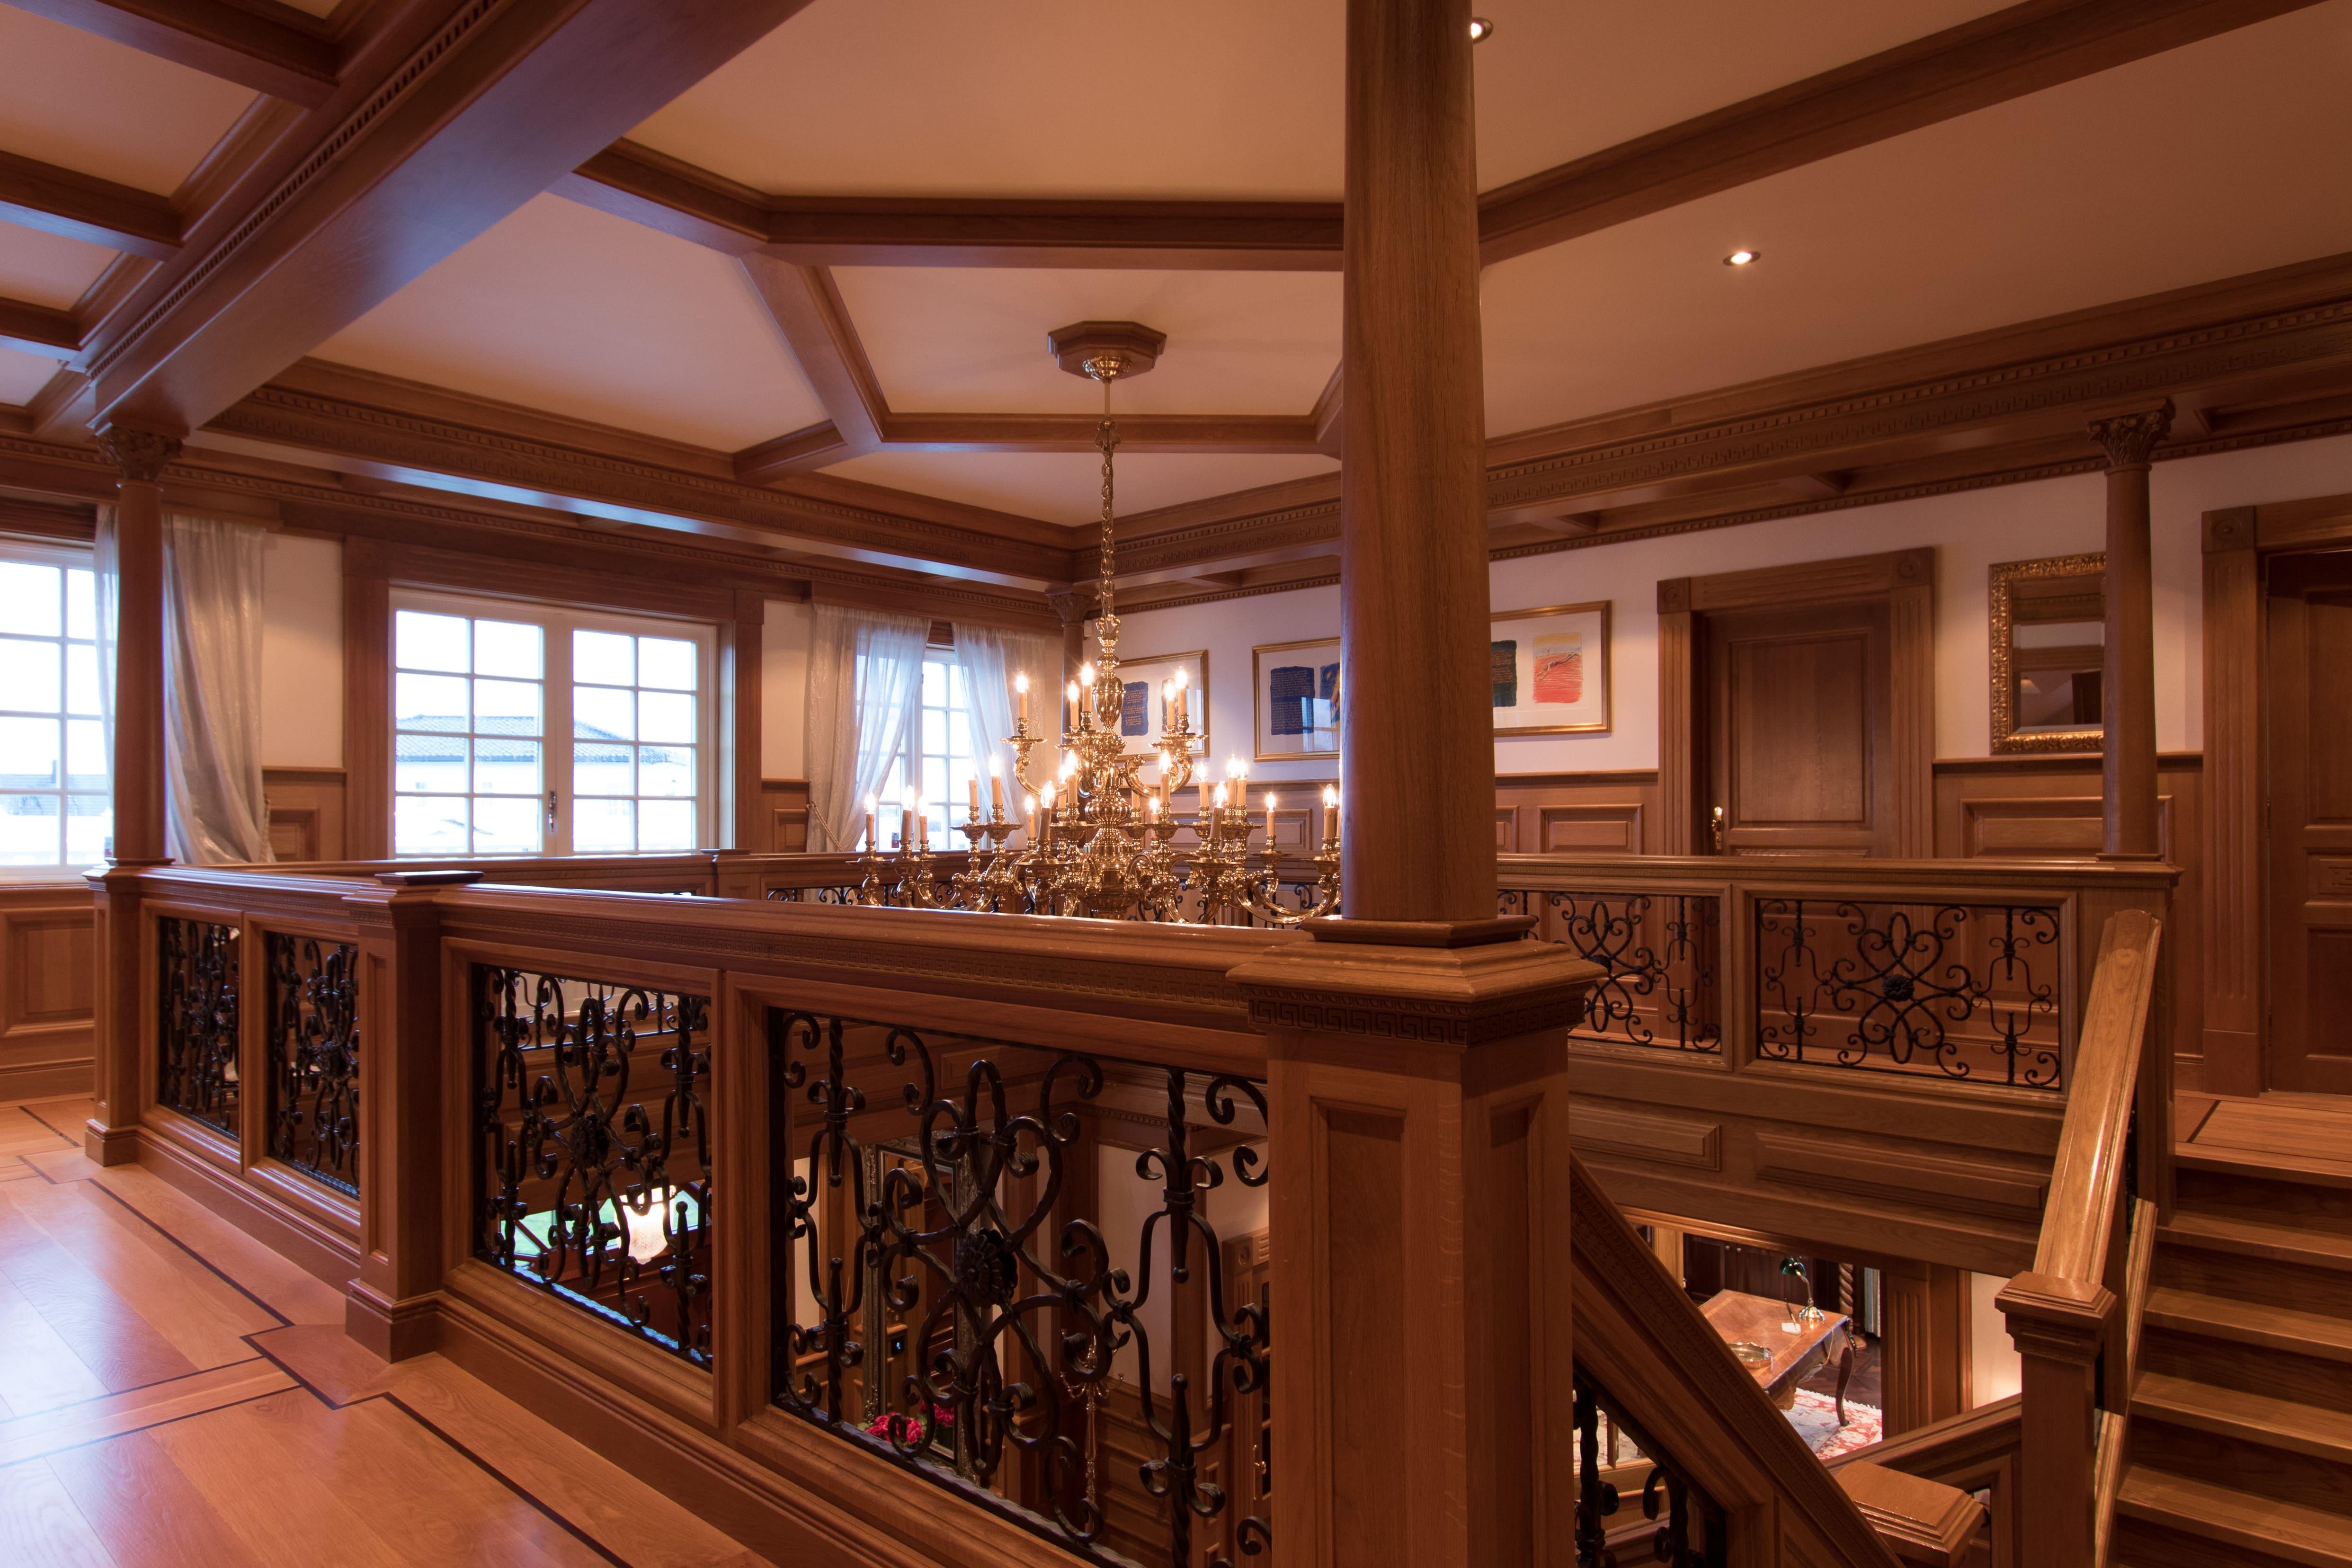 Second floor with master bedroom, bedrooms and bathrooms.